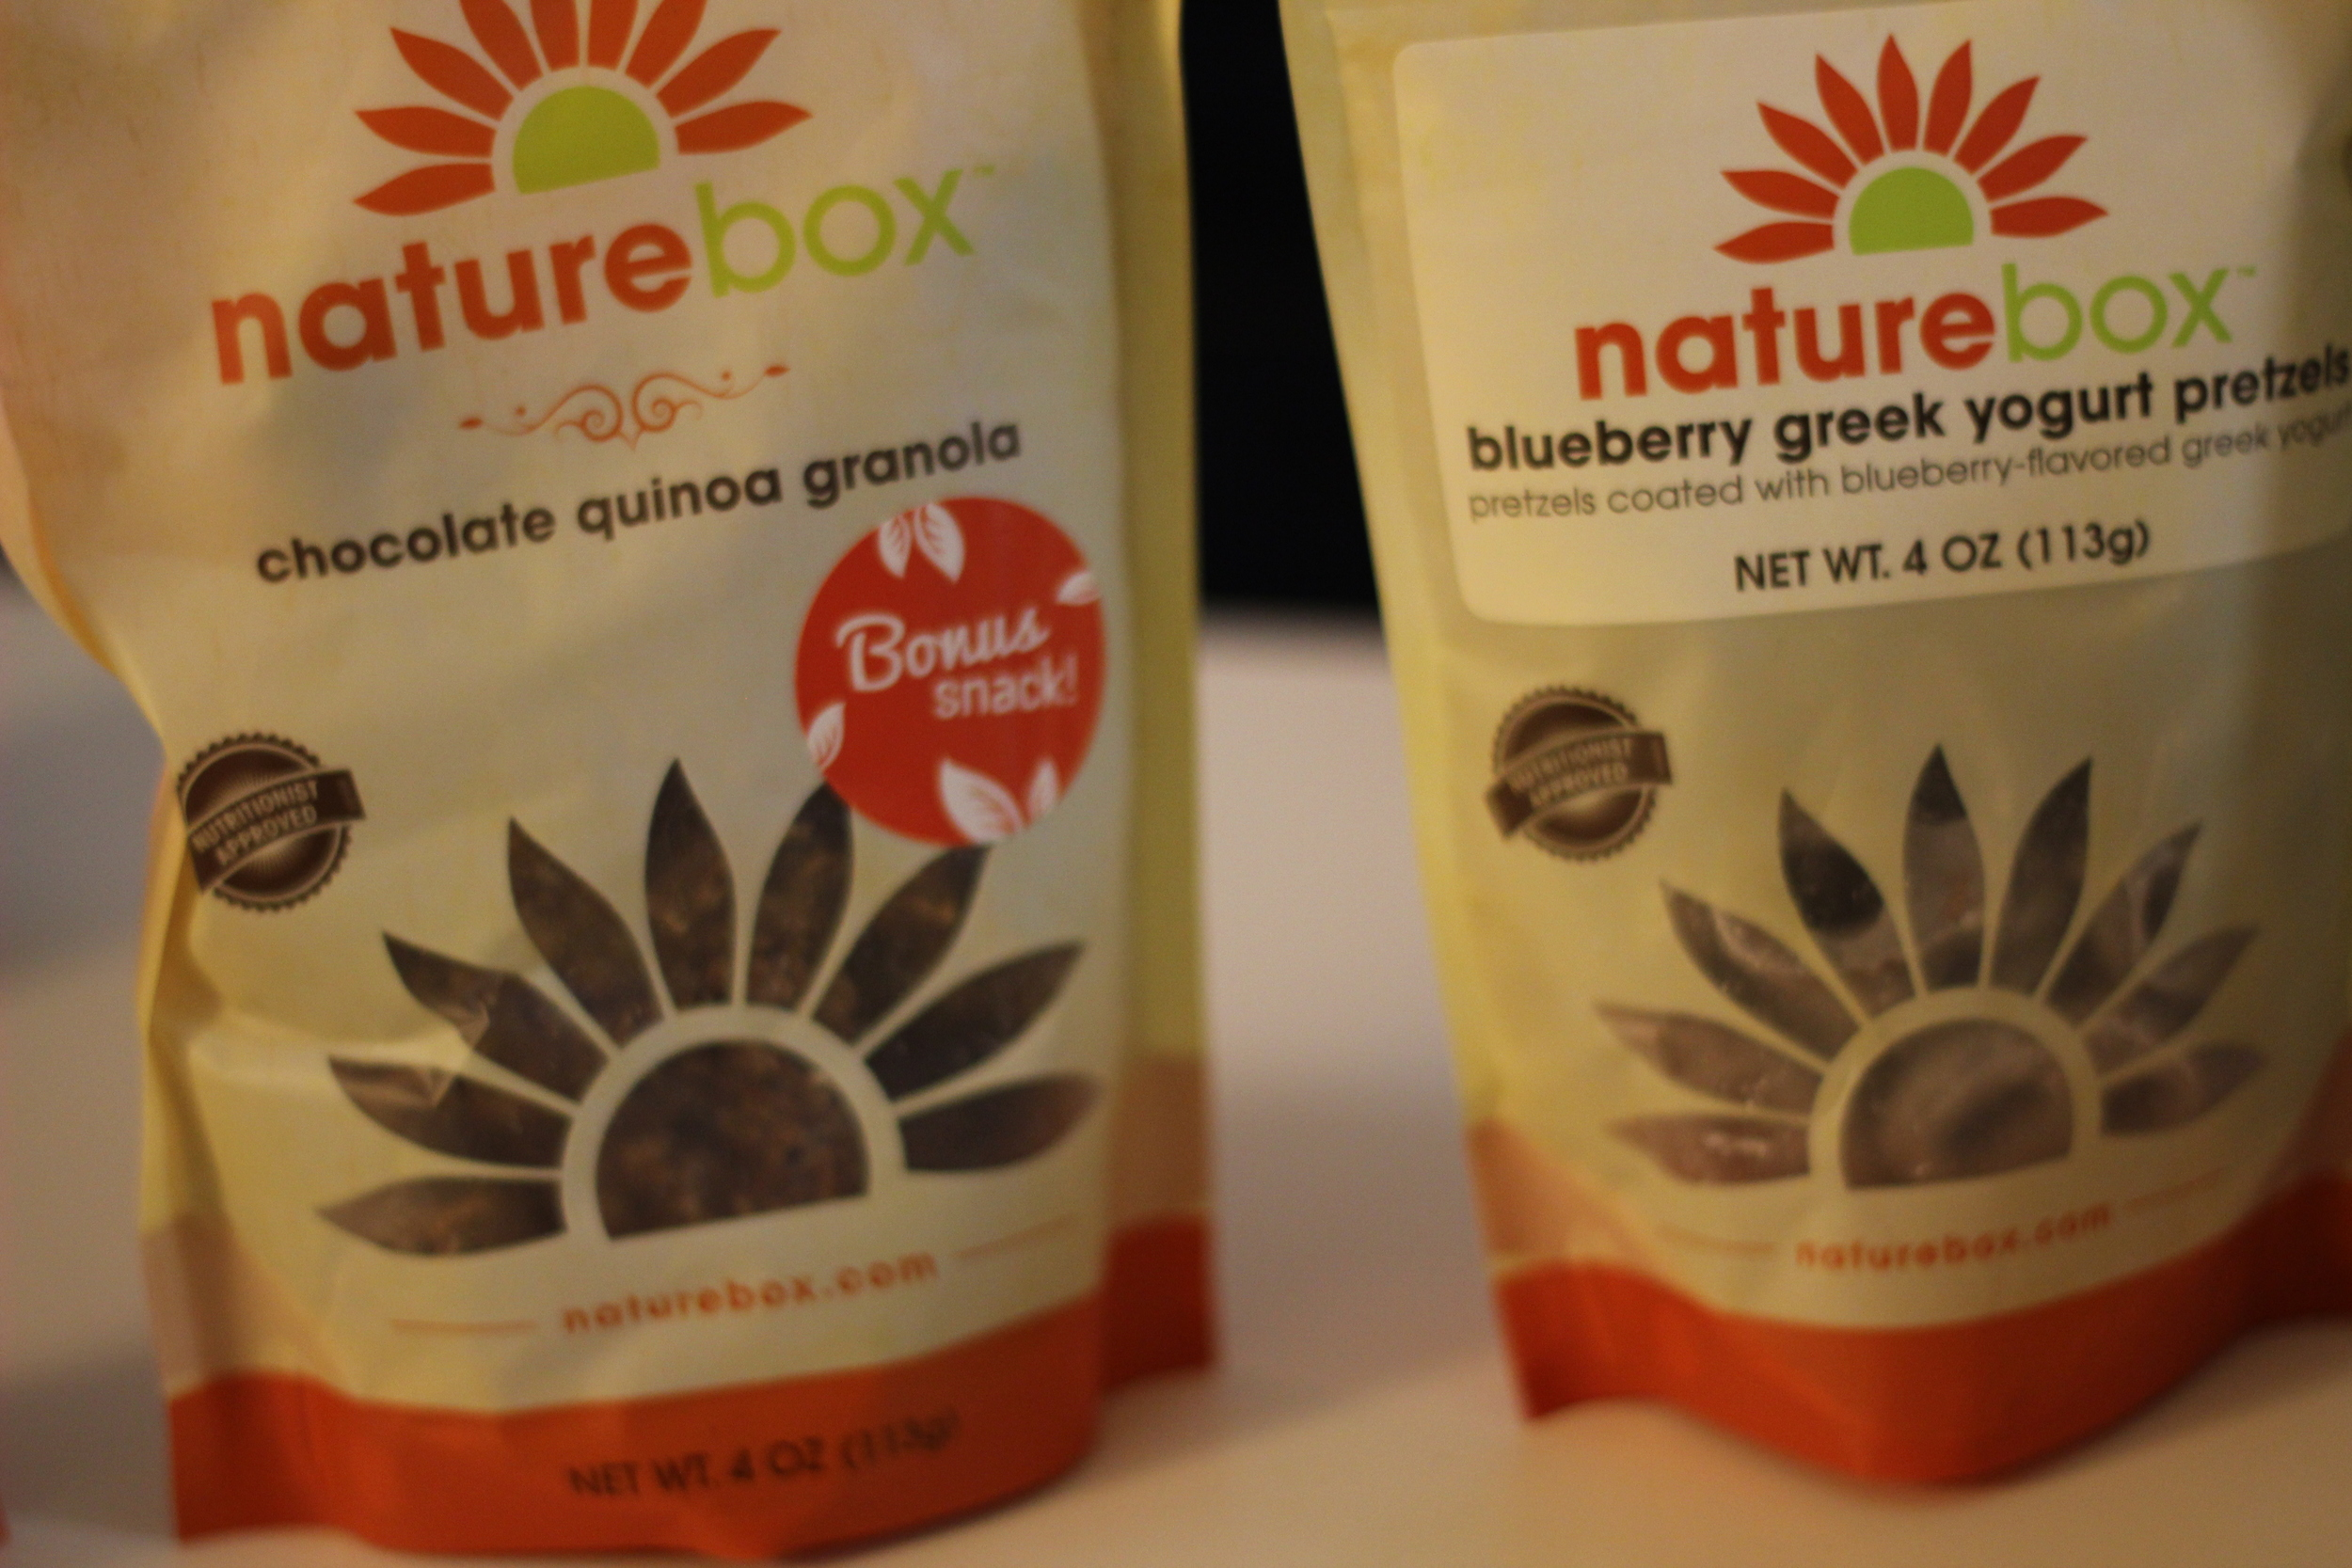 Naturebox Chocolate Quinoa Granola and Blueberry Greek Yogurt Pretzels